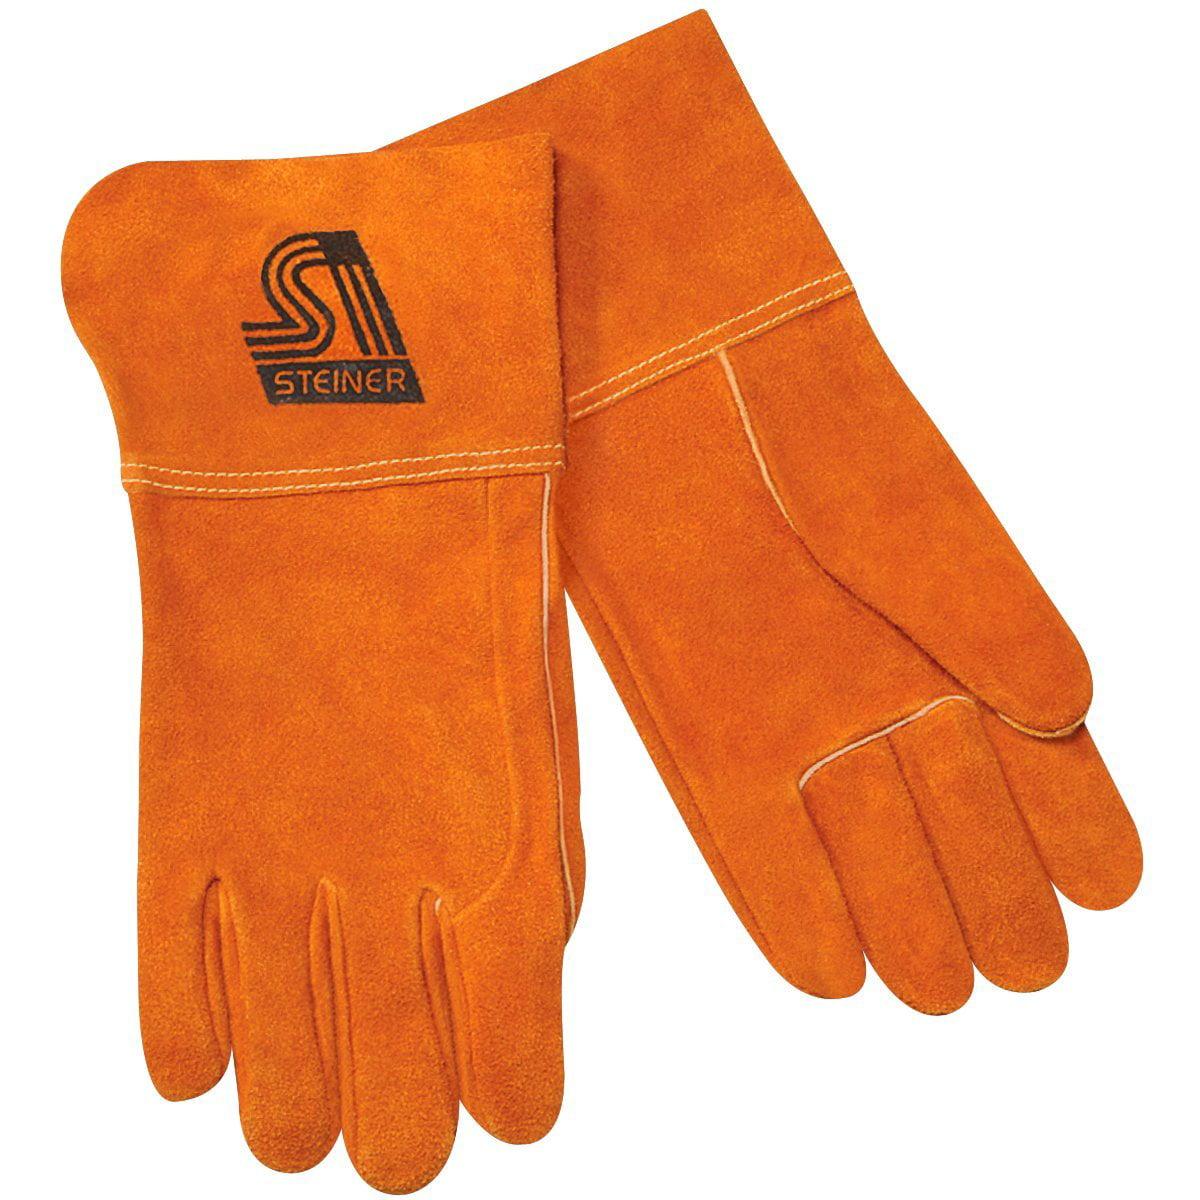 "Steiner STI-0214L Mig Welding 4"" Gloves, Side Split Cowhide, Lg"